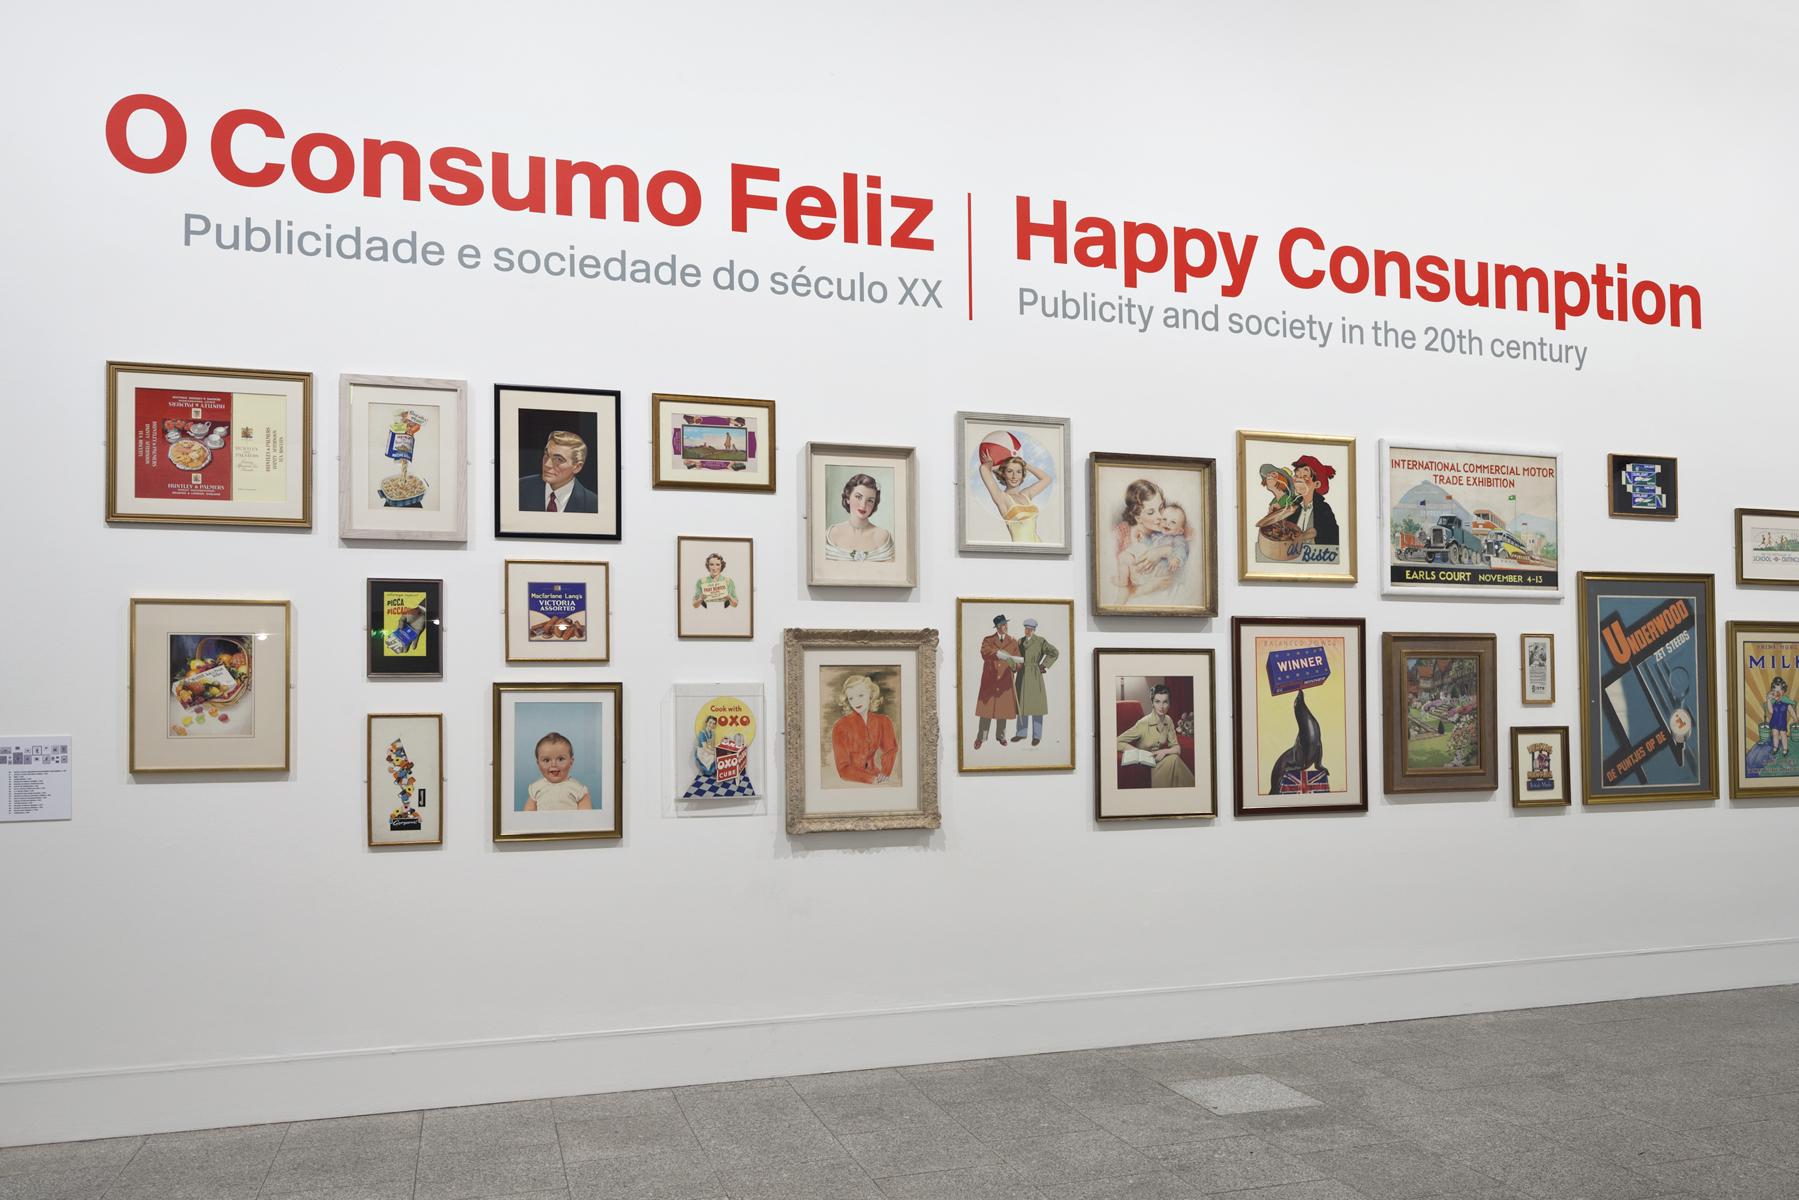 O ConsumoFeliz_HappyConsumption©DavidRato